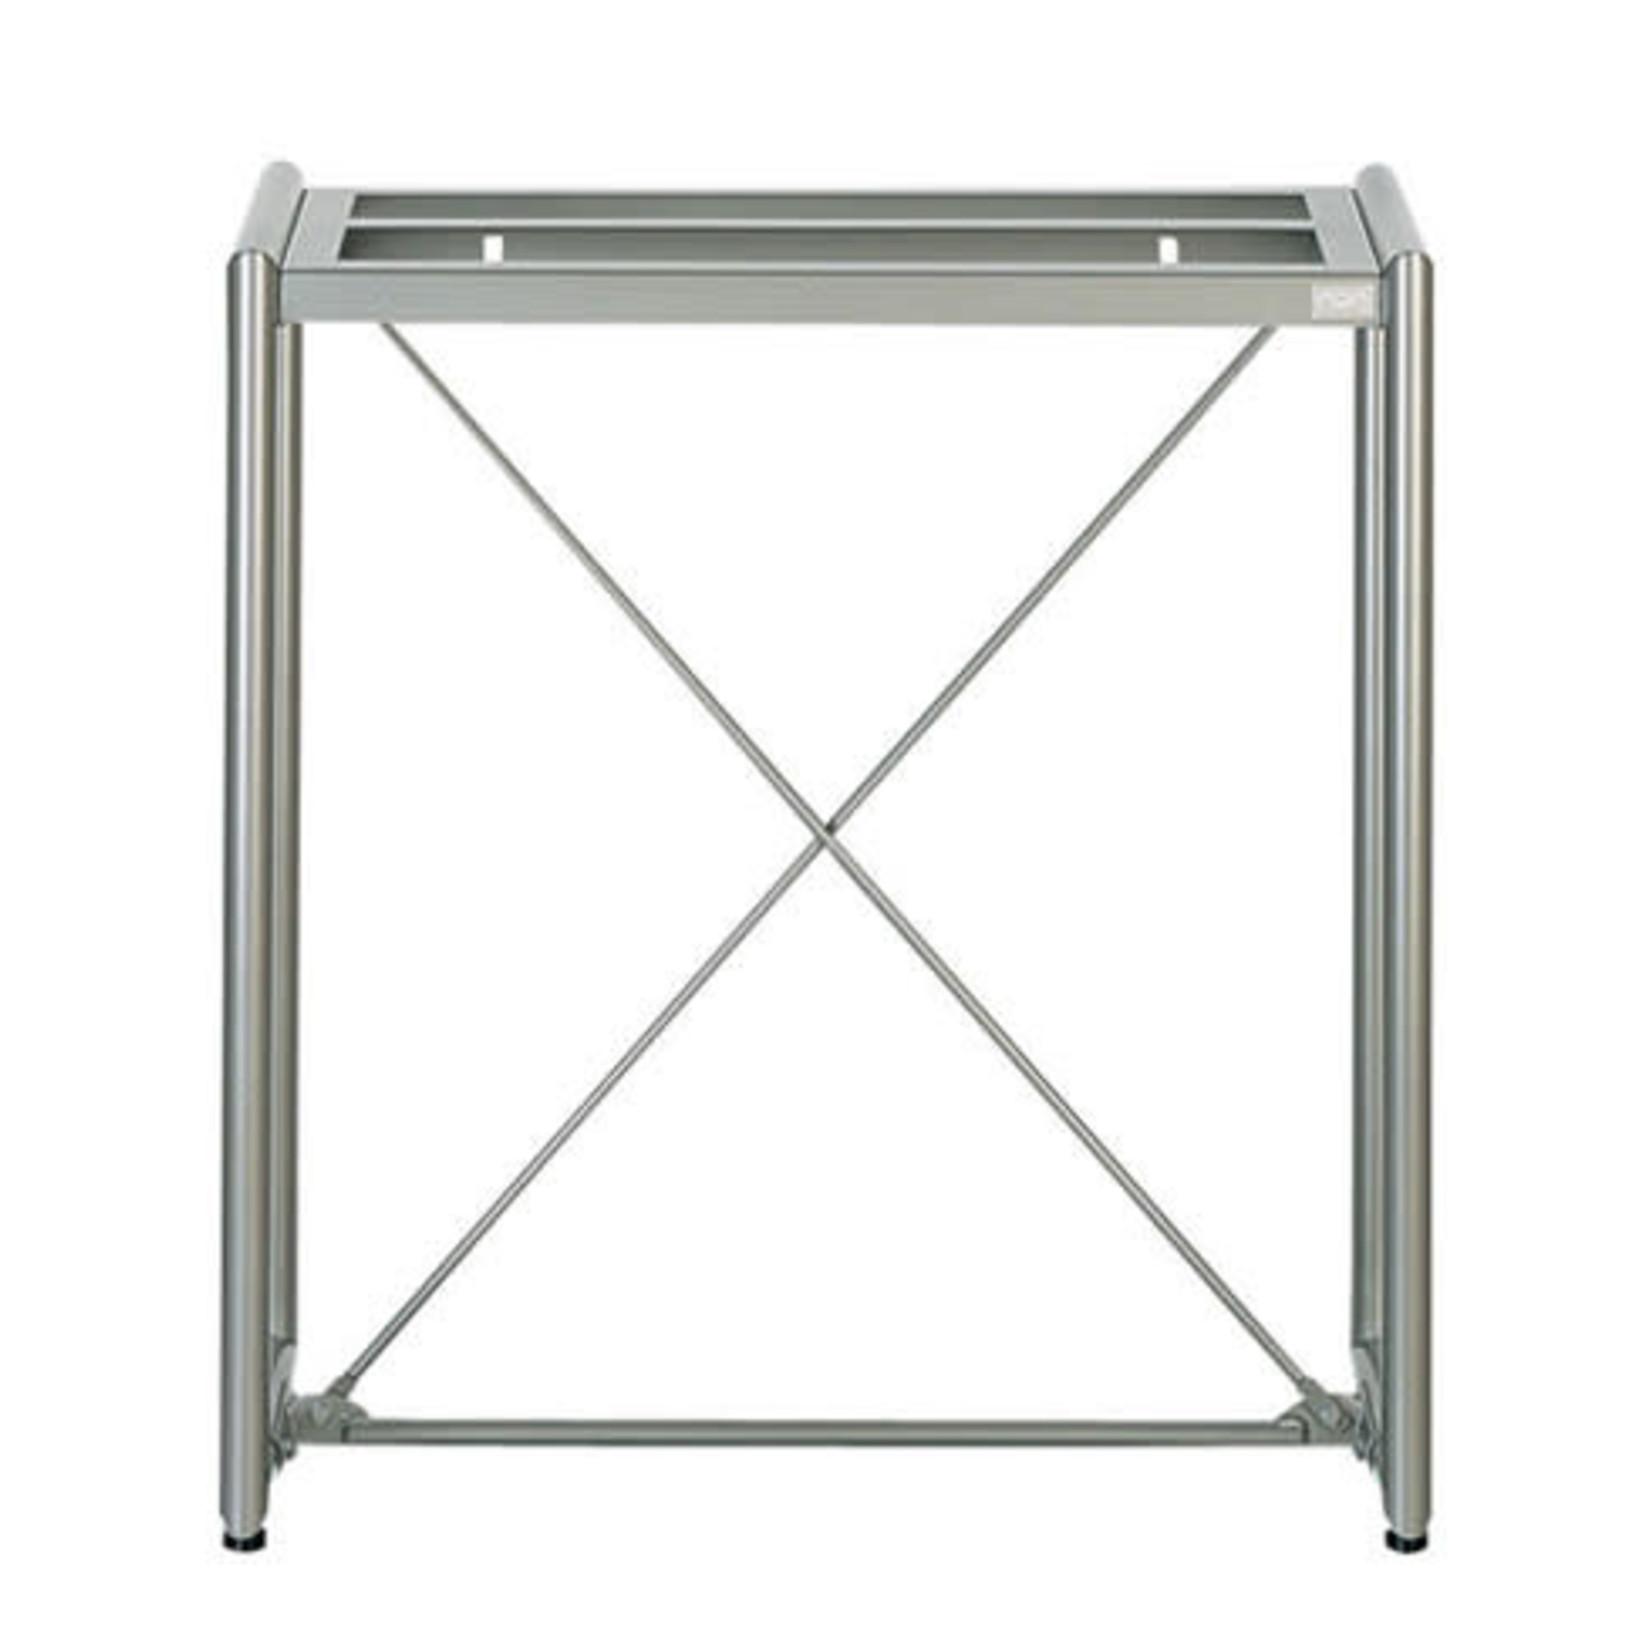 ADA Garden Stand-60 Metalic (60 x 30 cm)-Undercarriage